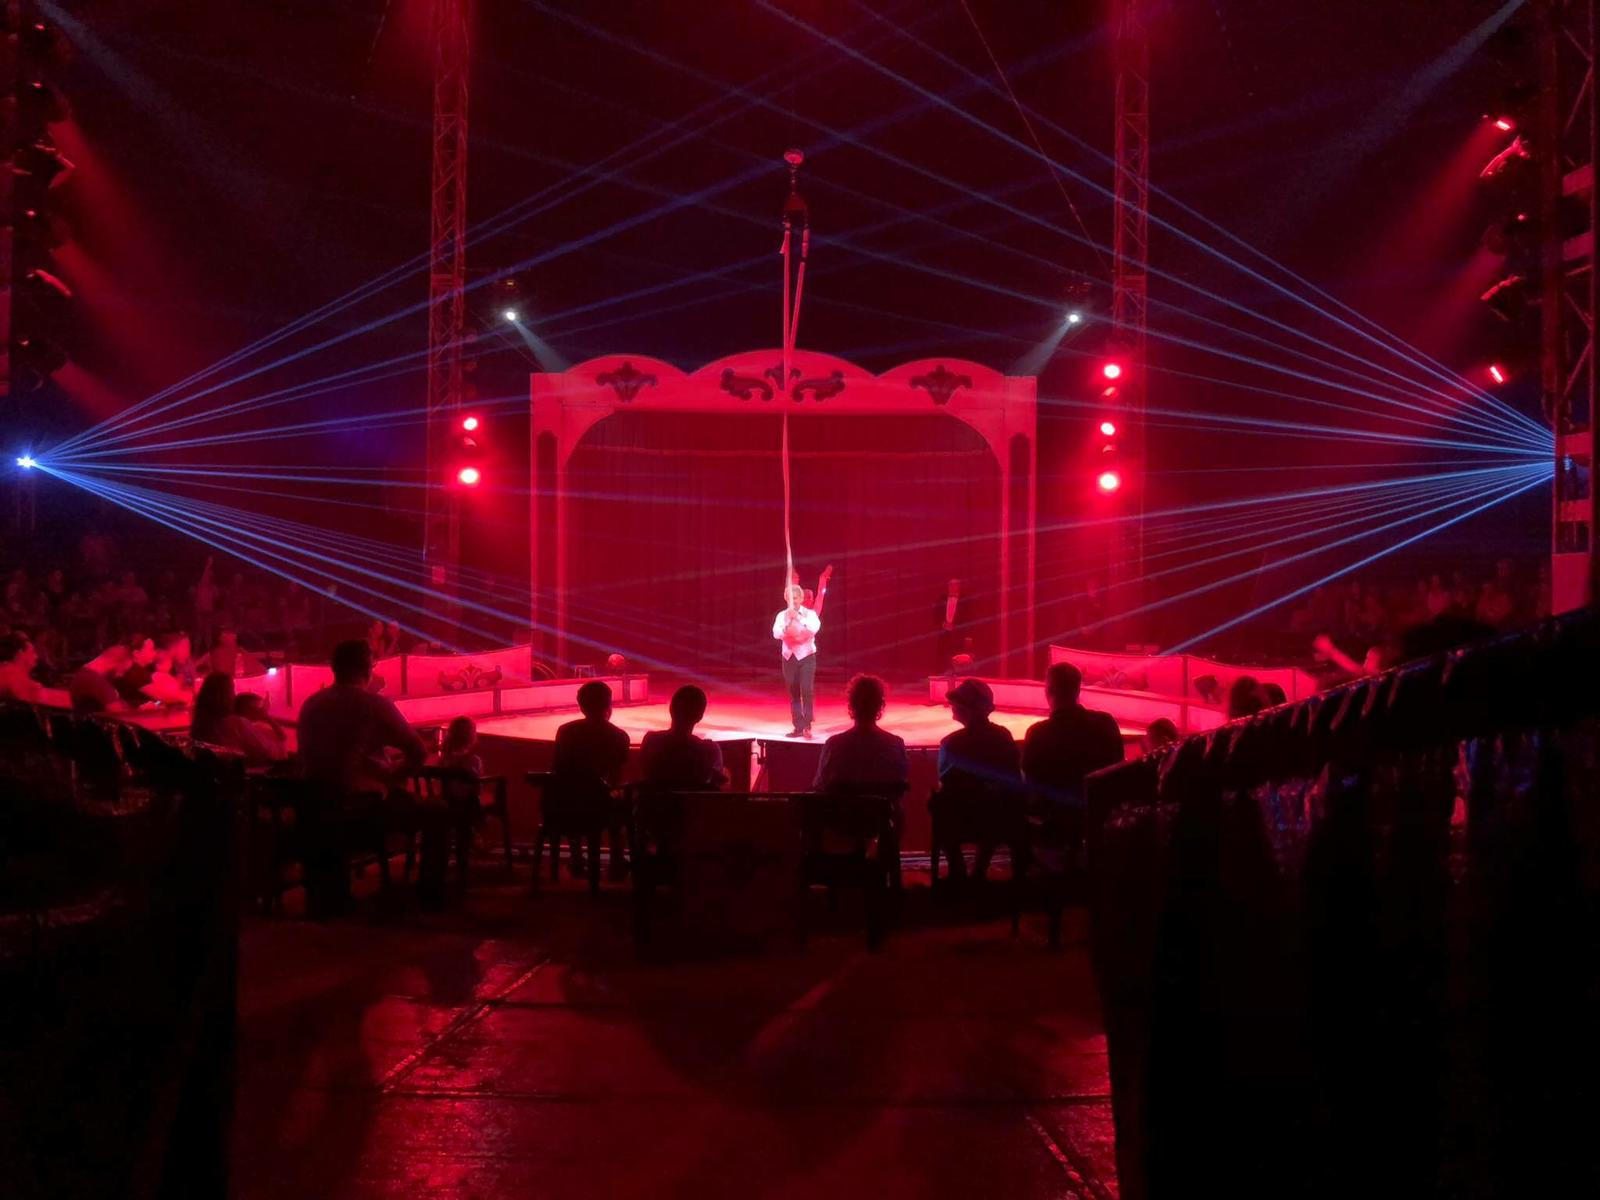 Interior Circo las Vegas